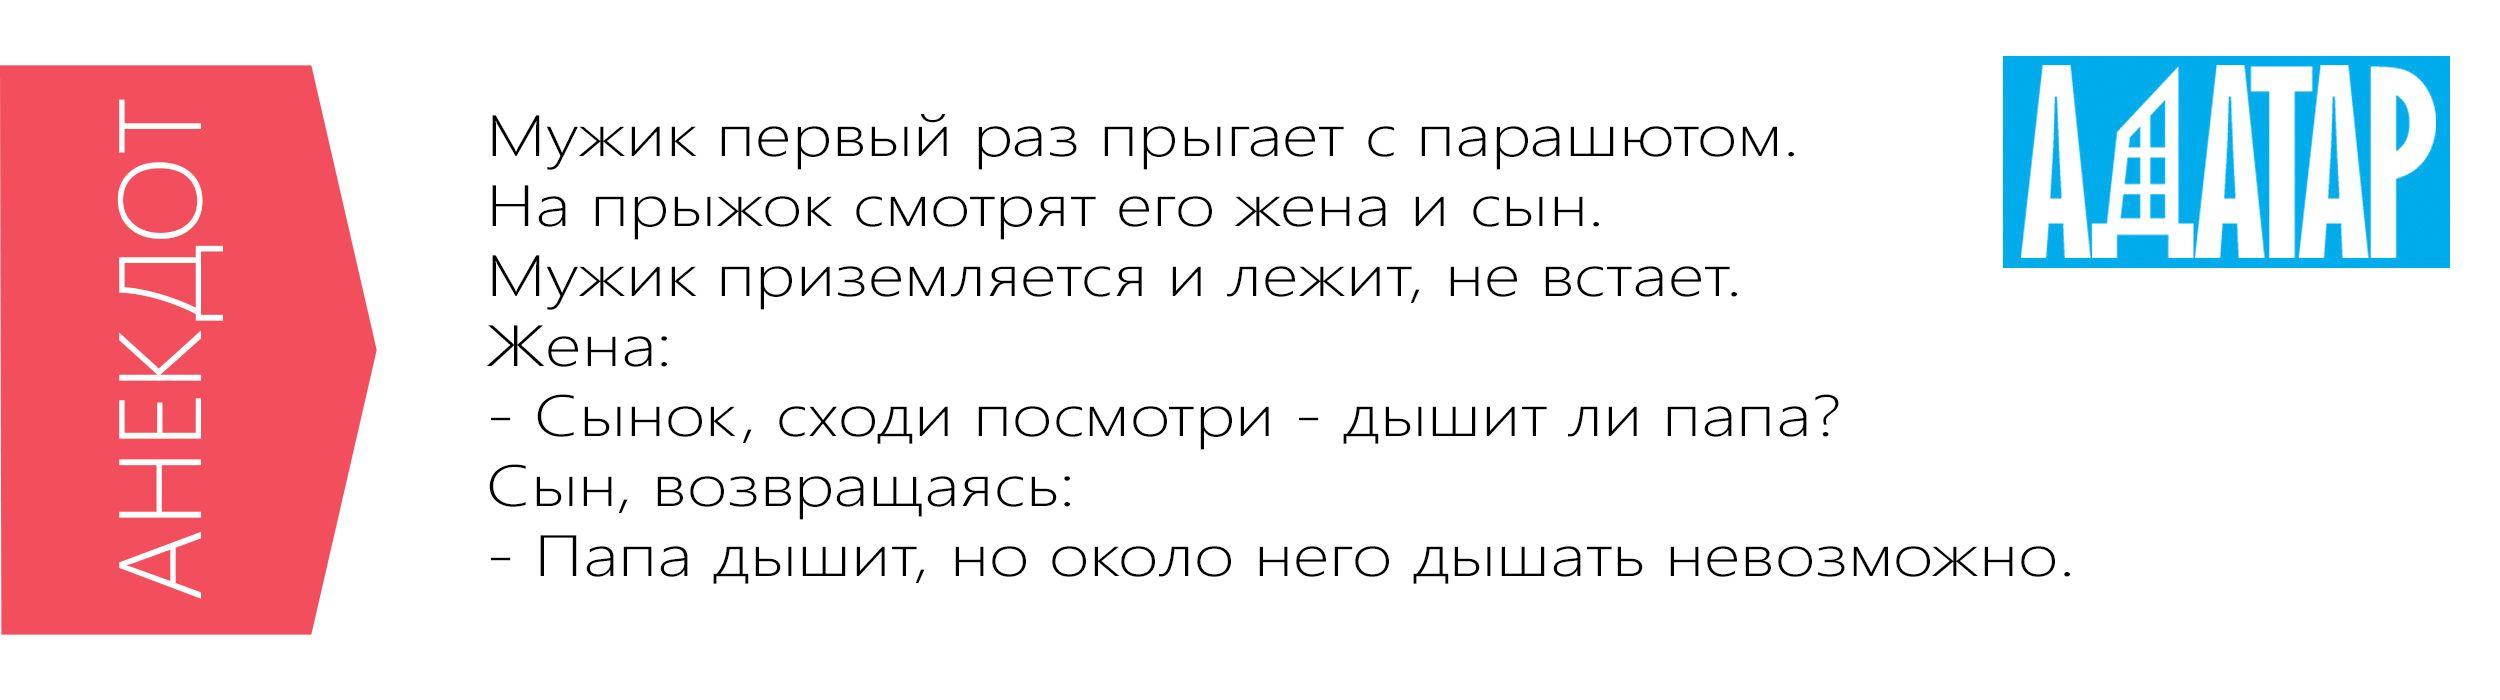 АНЕКДОТ 47.jpg